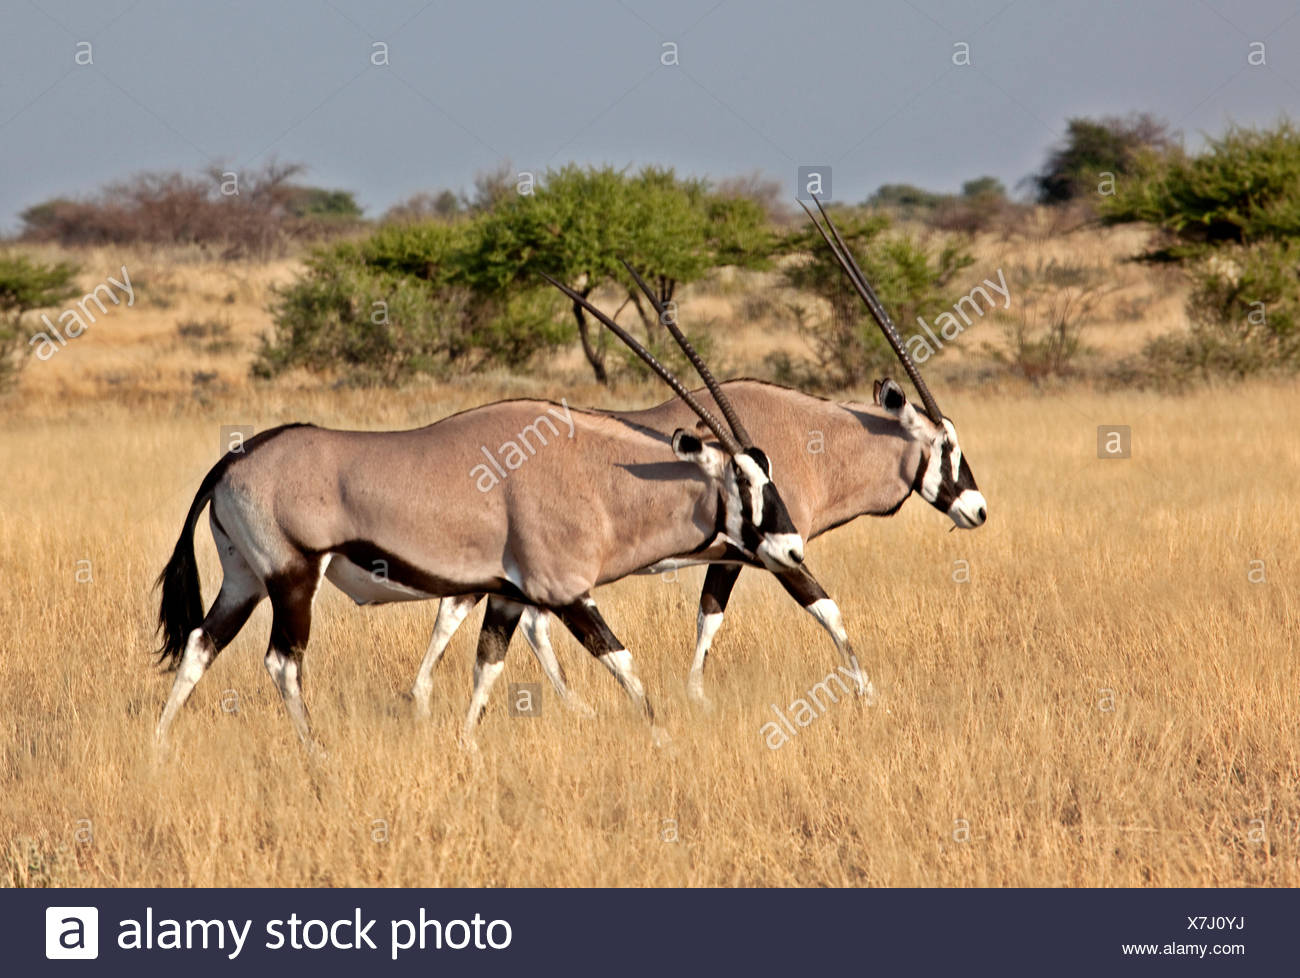 Gemsbok, oryx gazella, Central Kalahari Game Reserve, Botswana, Africa - Stock Image